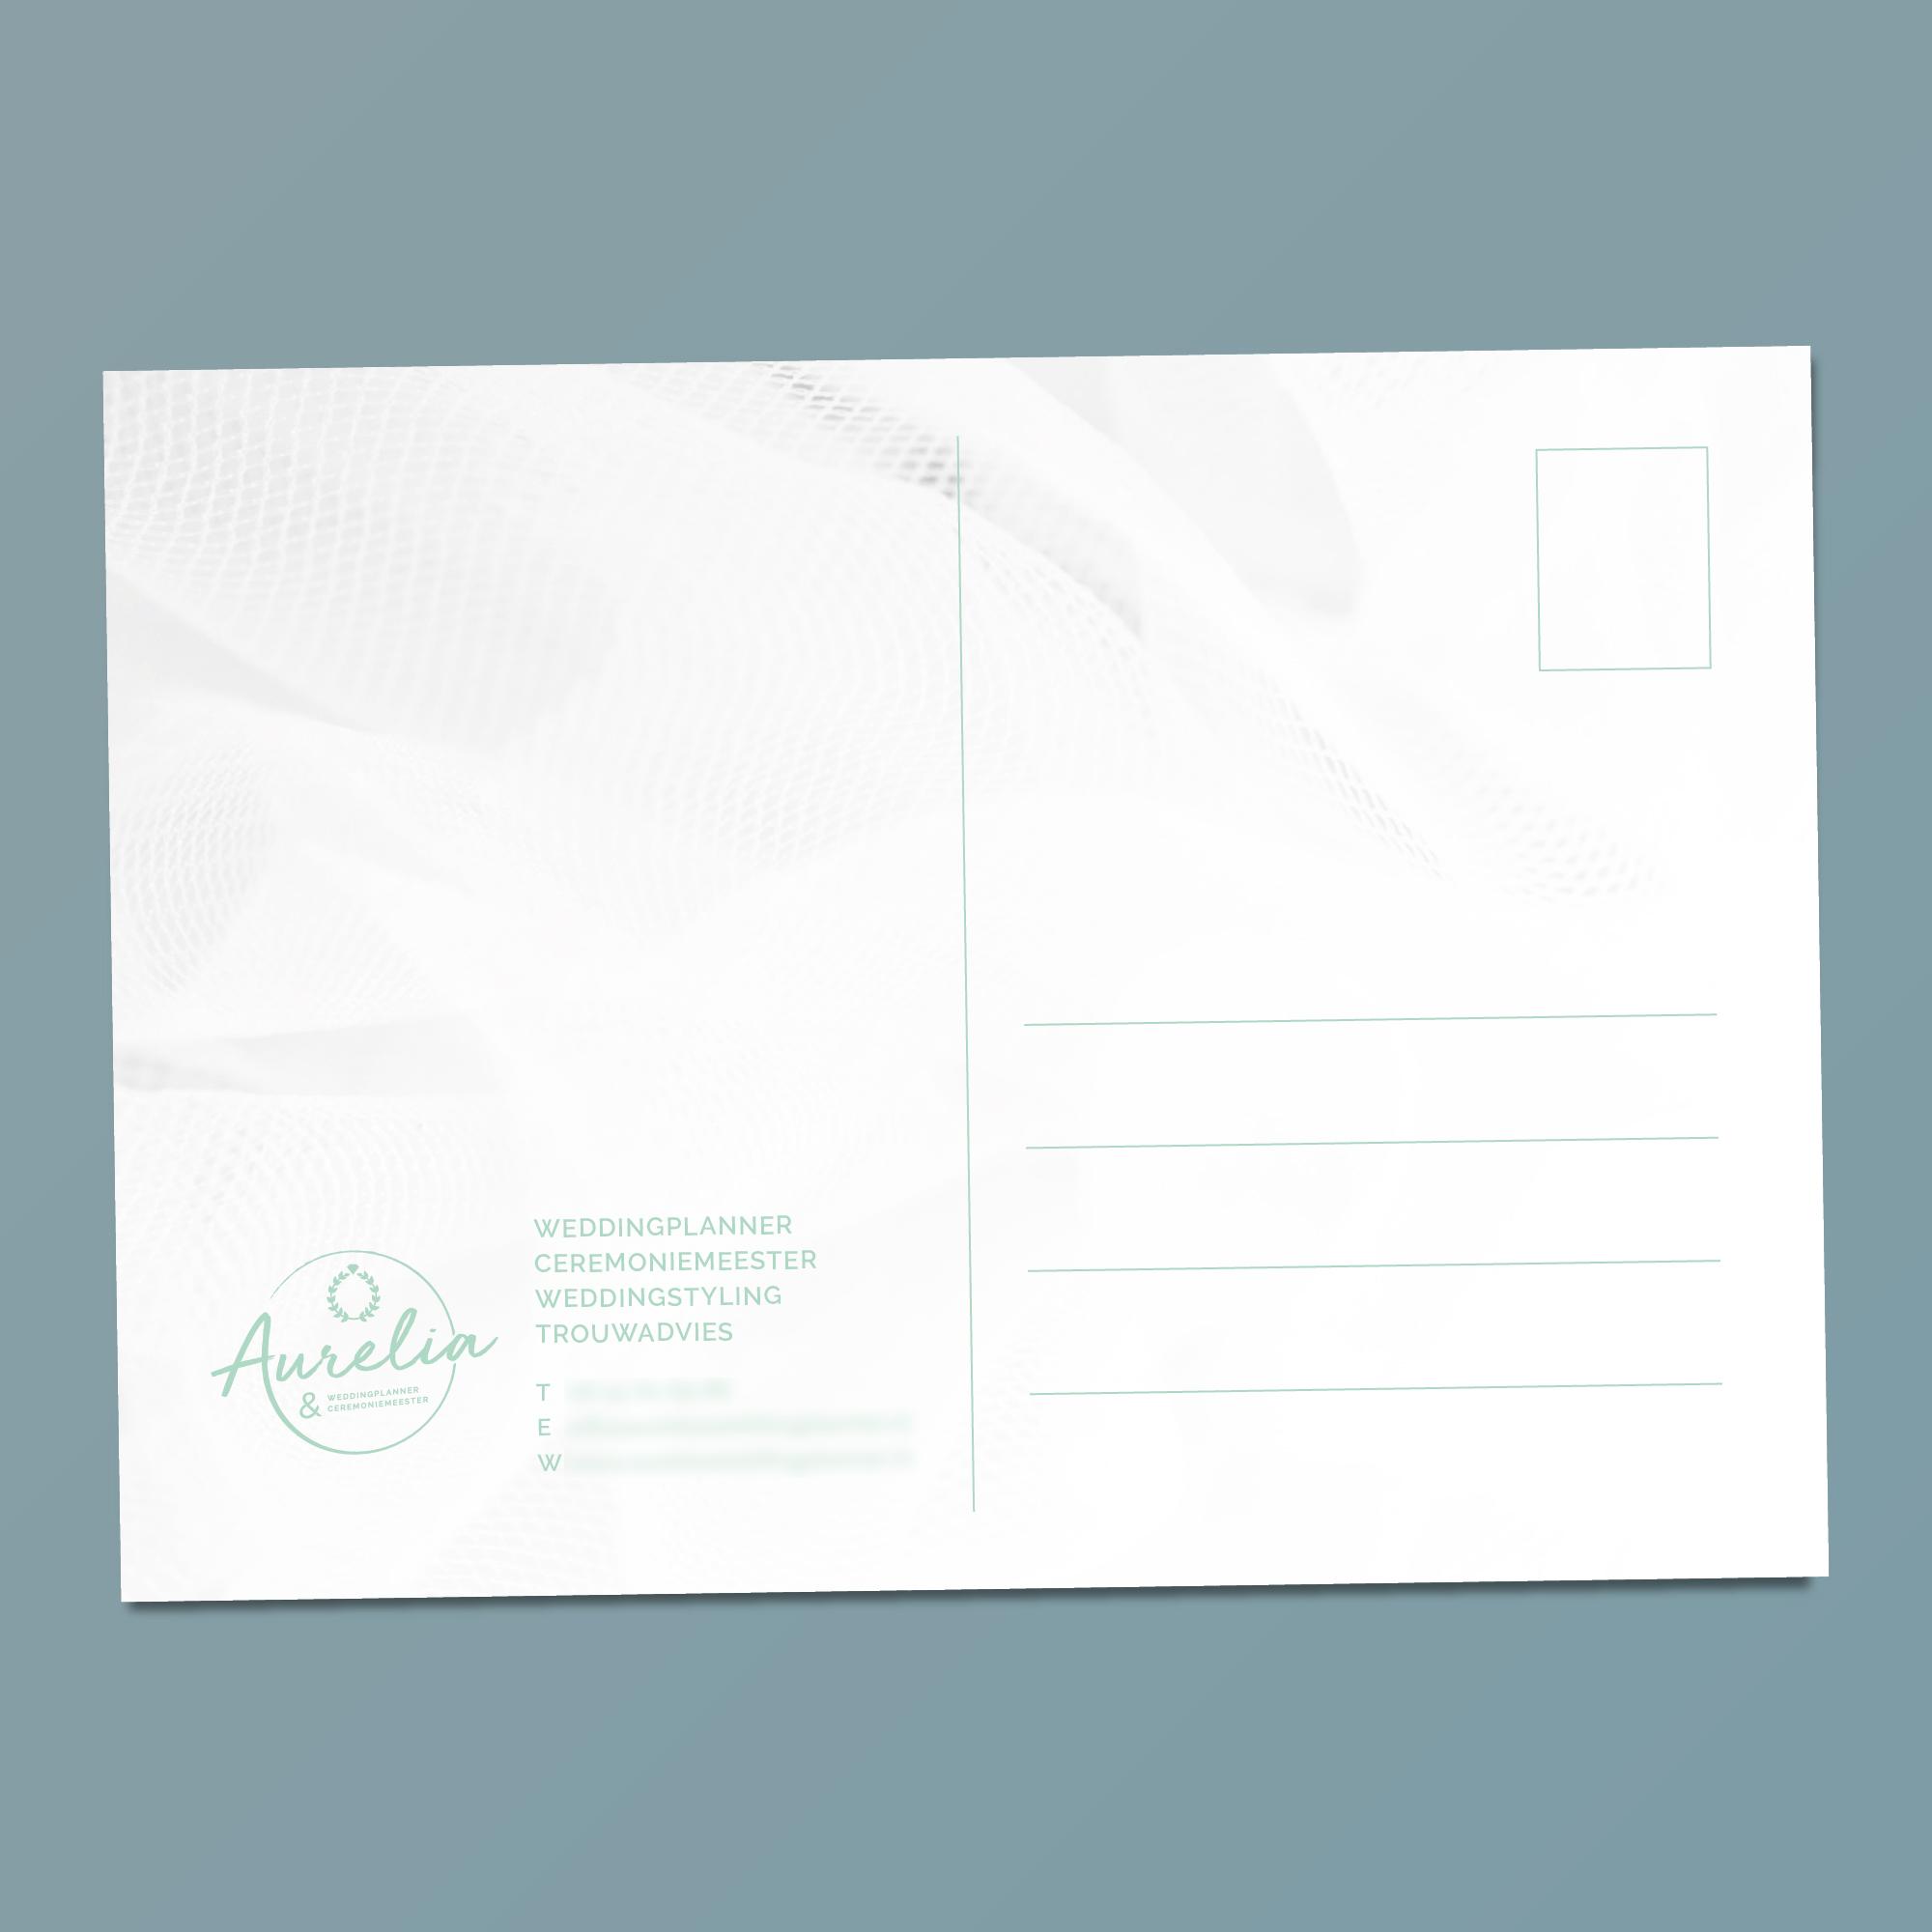 portfolio-dimgray-huisstijl-aureliaceremoniemeester-ansichtkaart-achter